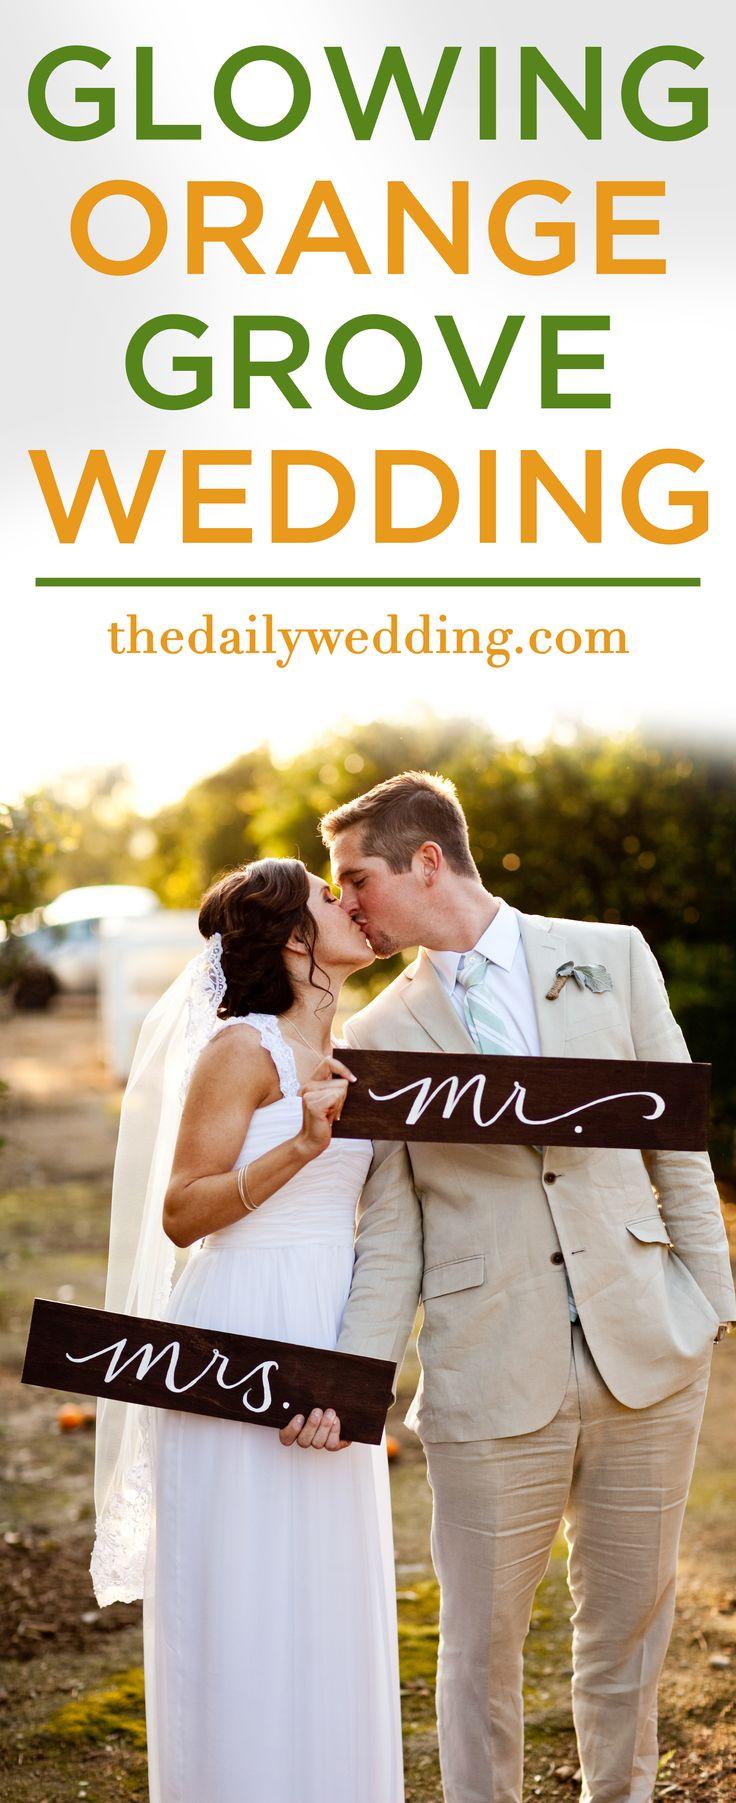 So gorgeous!! View the full wedding here: http://thedailywedding.com/2015/12/31/glowing-orange-grove-wedding-crista-cody/